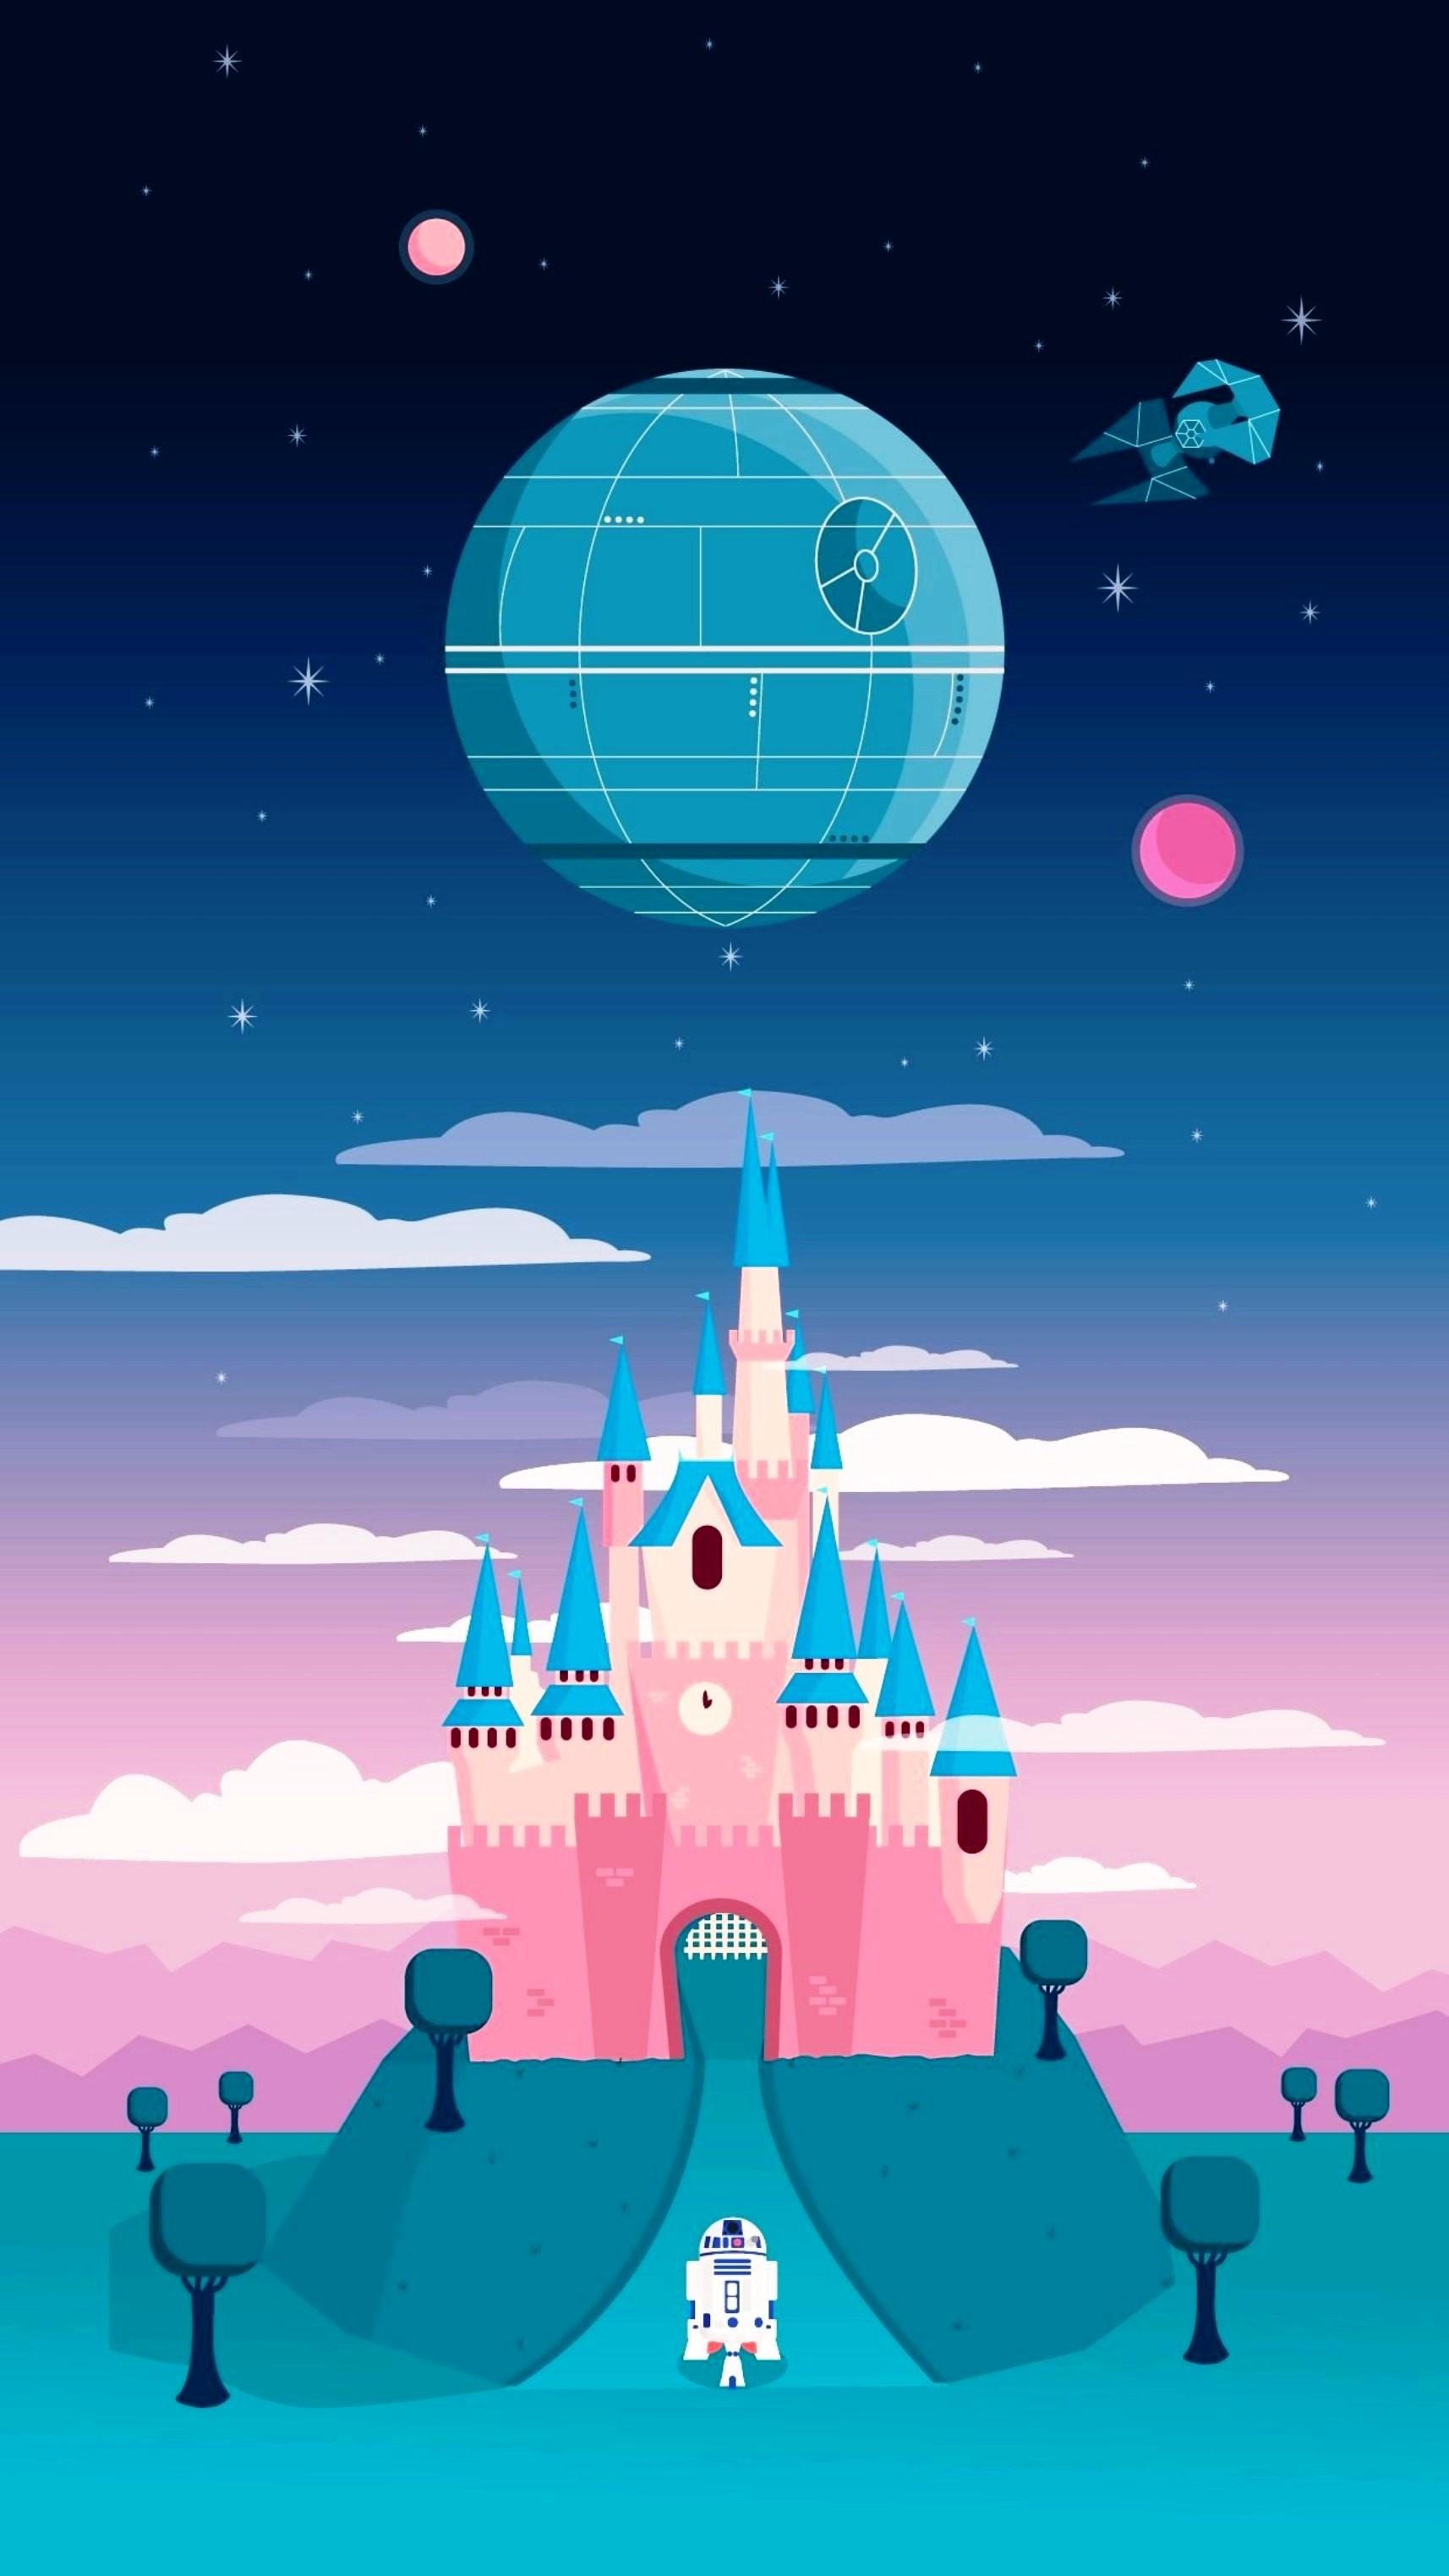 25 best ideas about <b>Disney Wallpaper</b> on Pinterest |